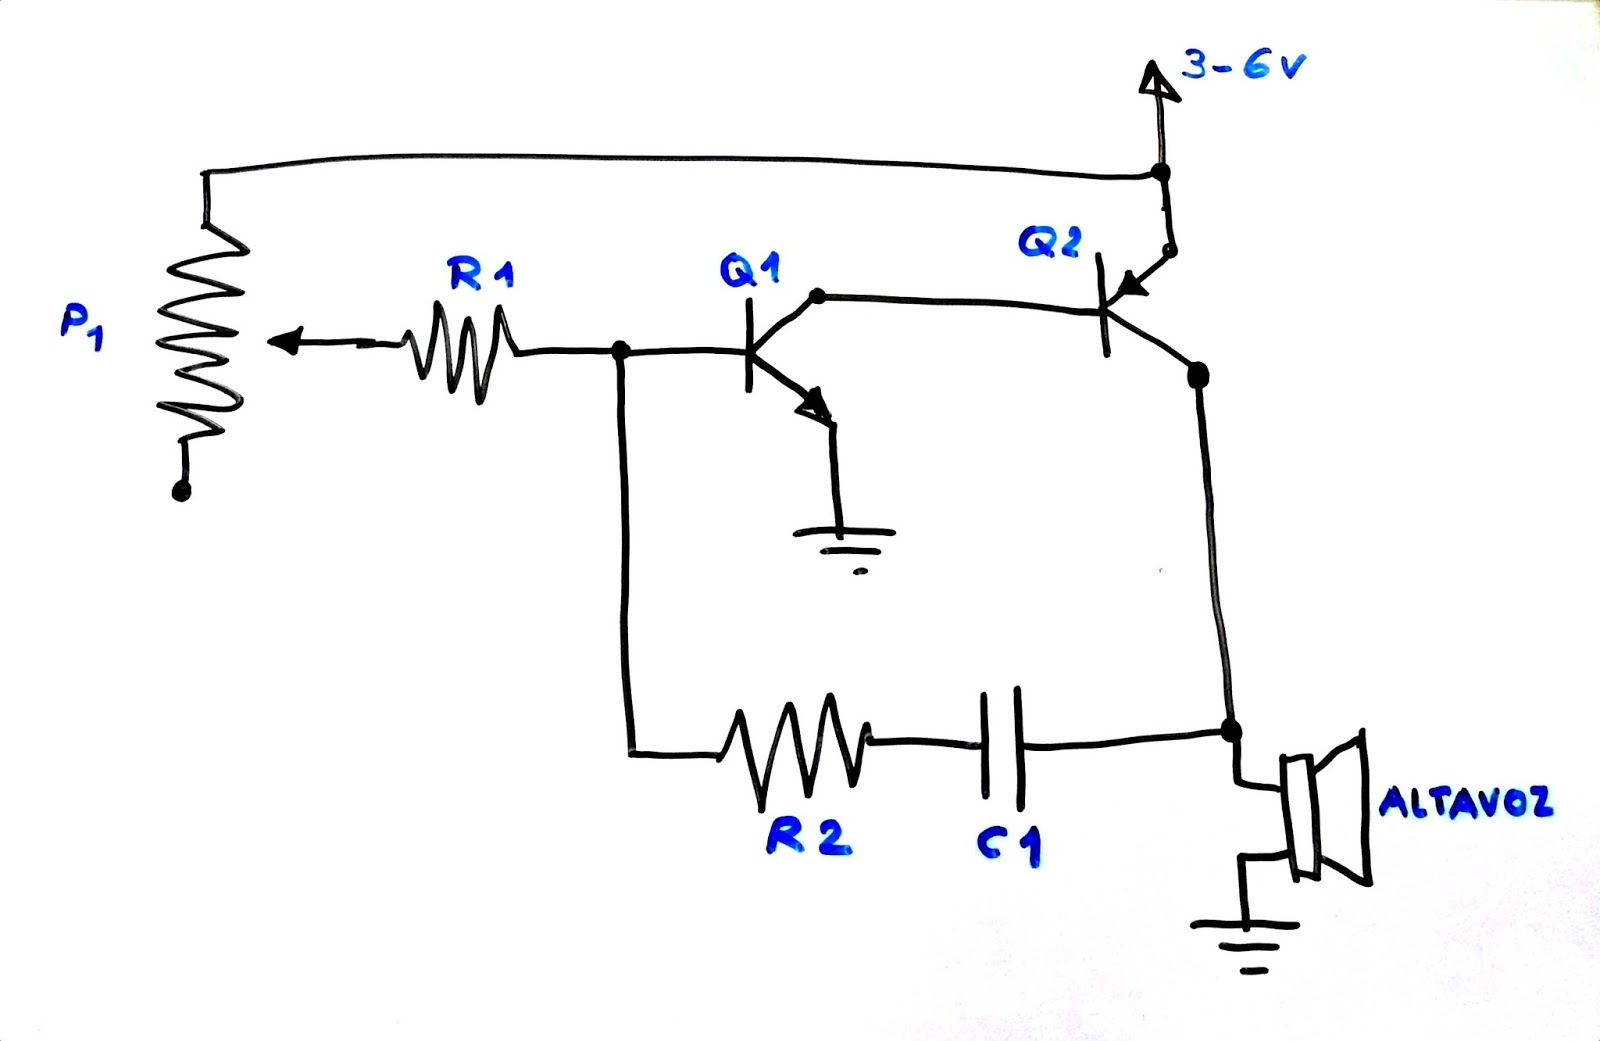 corriente a u00e9rea  peque u00f1o circuito para generar un tono audible